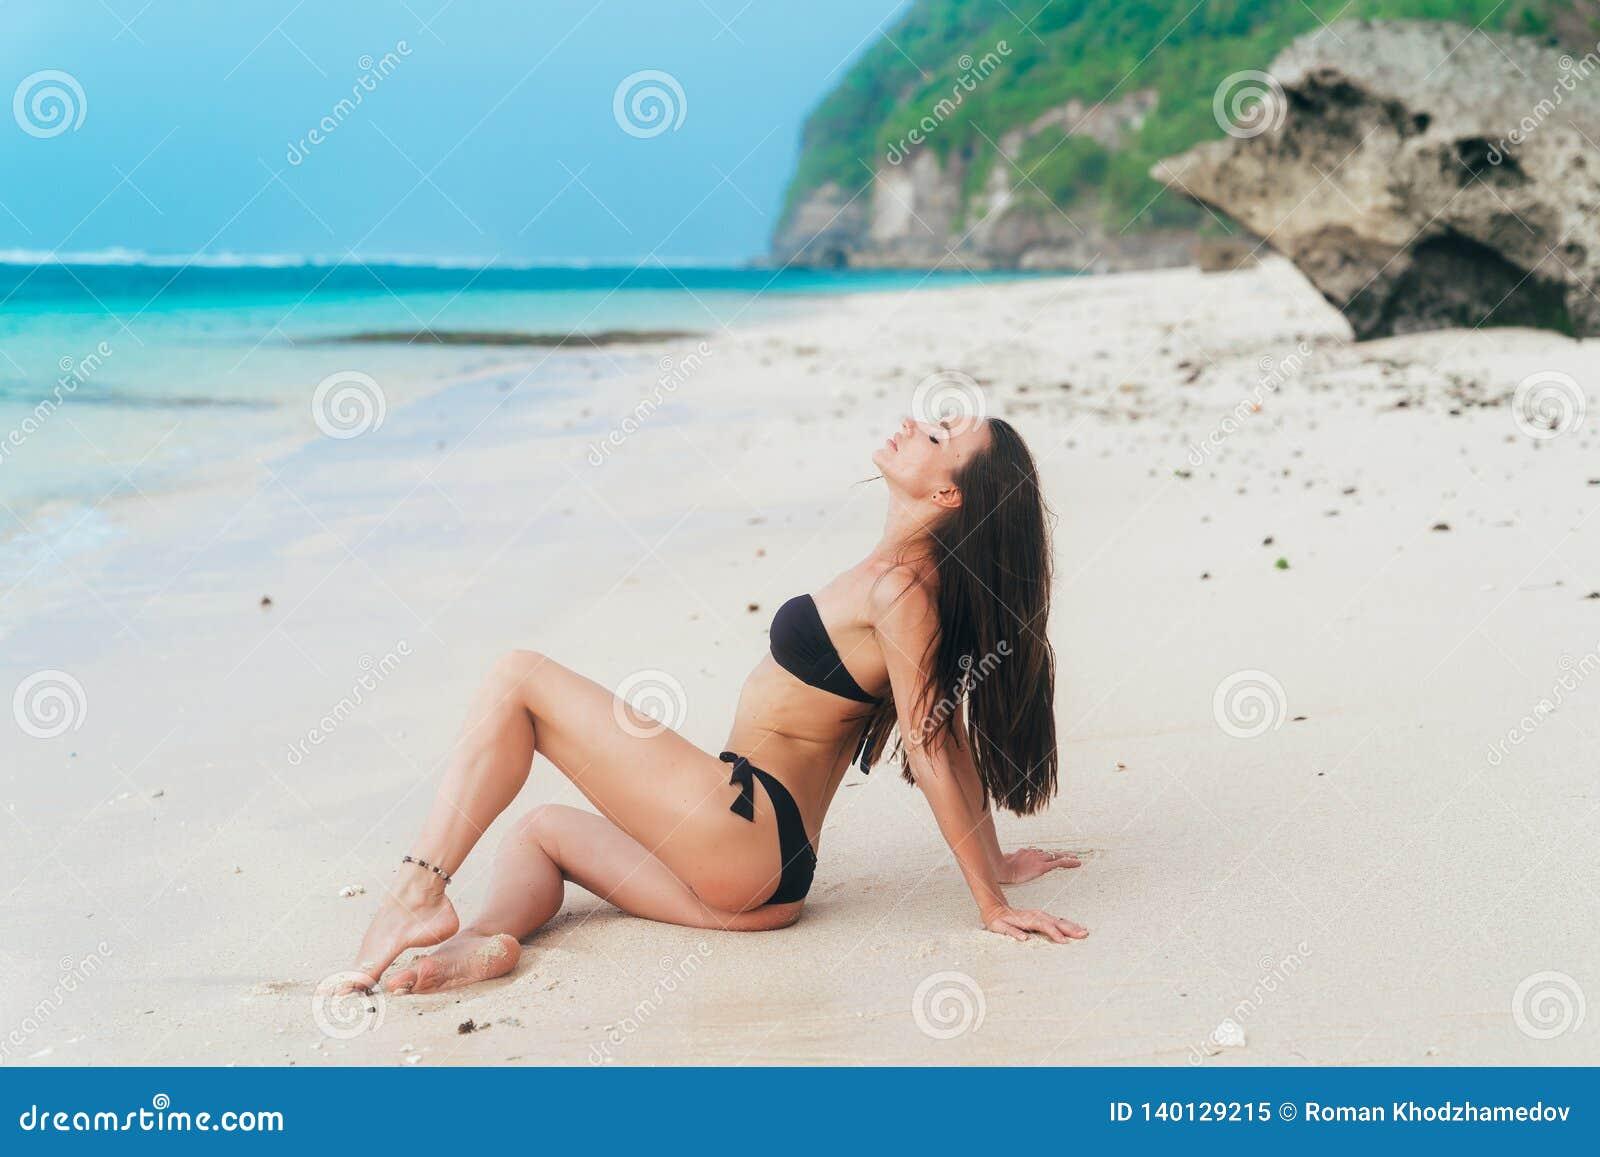 girl beach pics